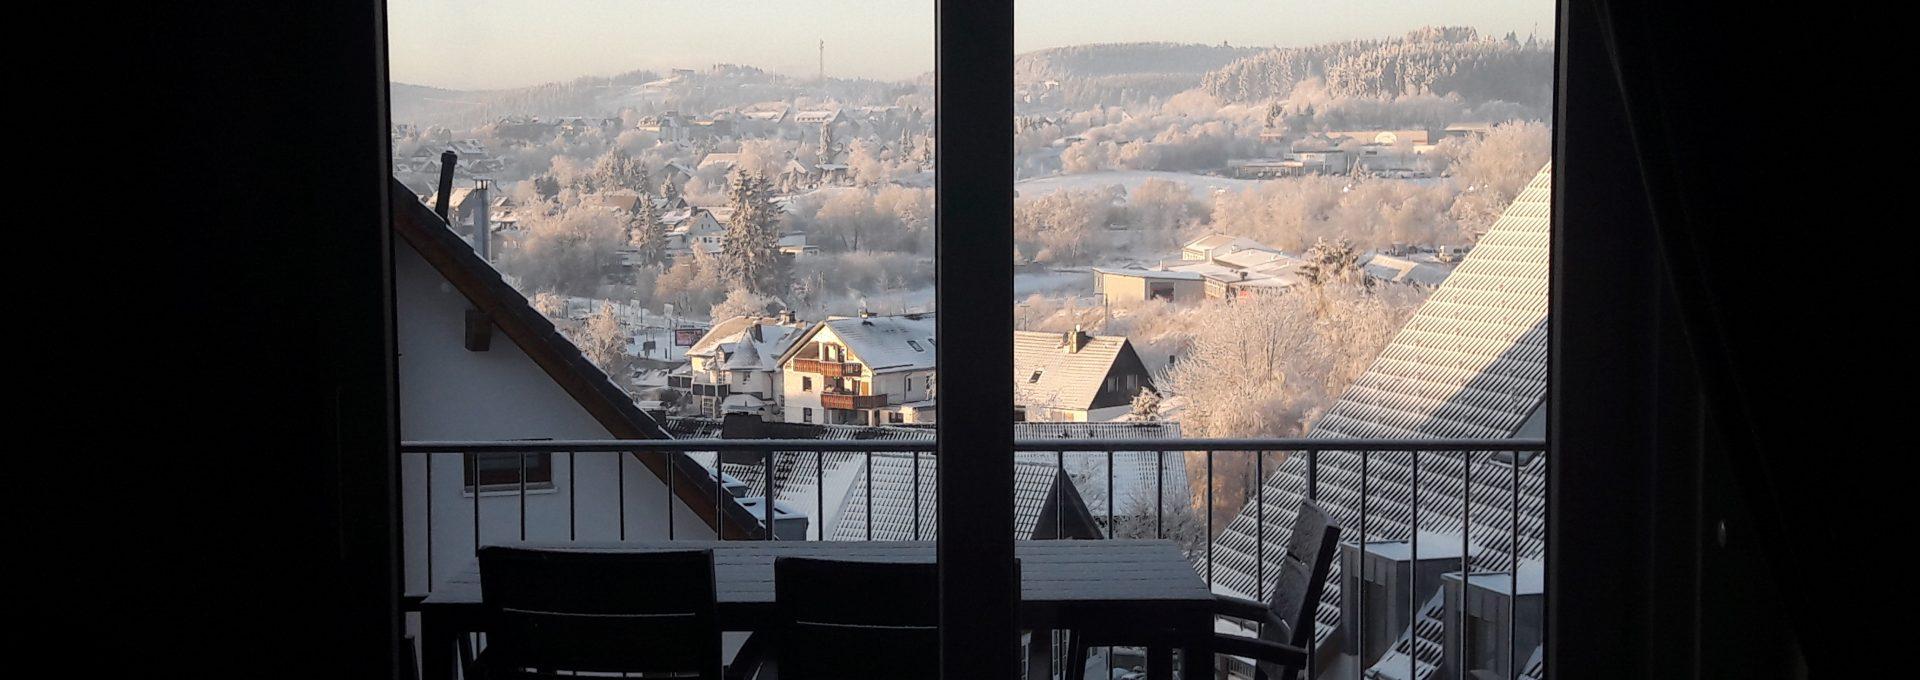 Winterberg/Zeeland